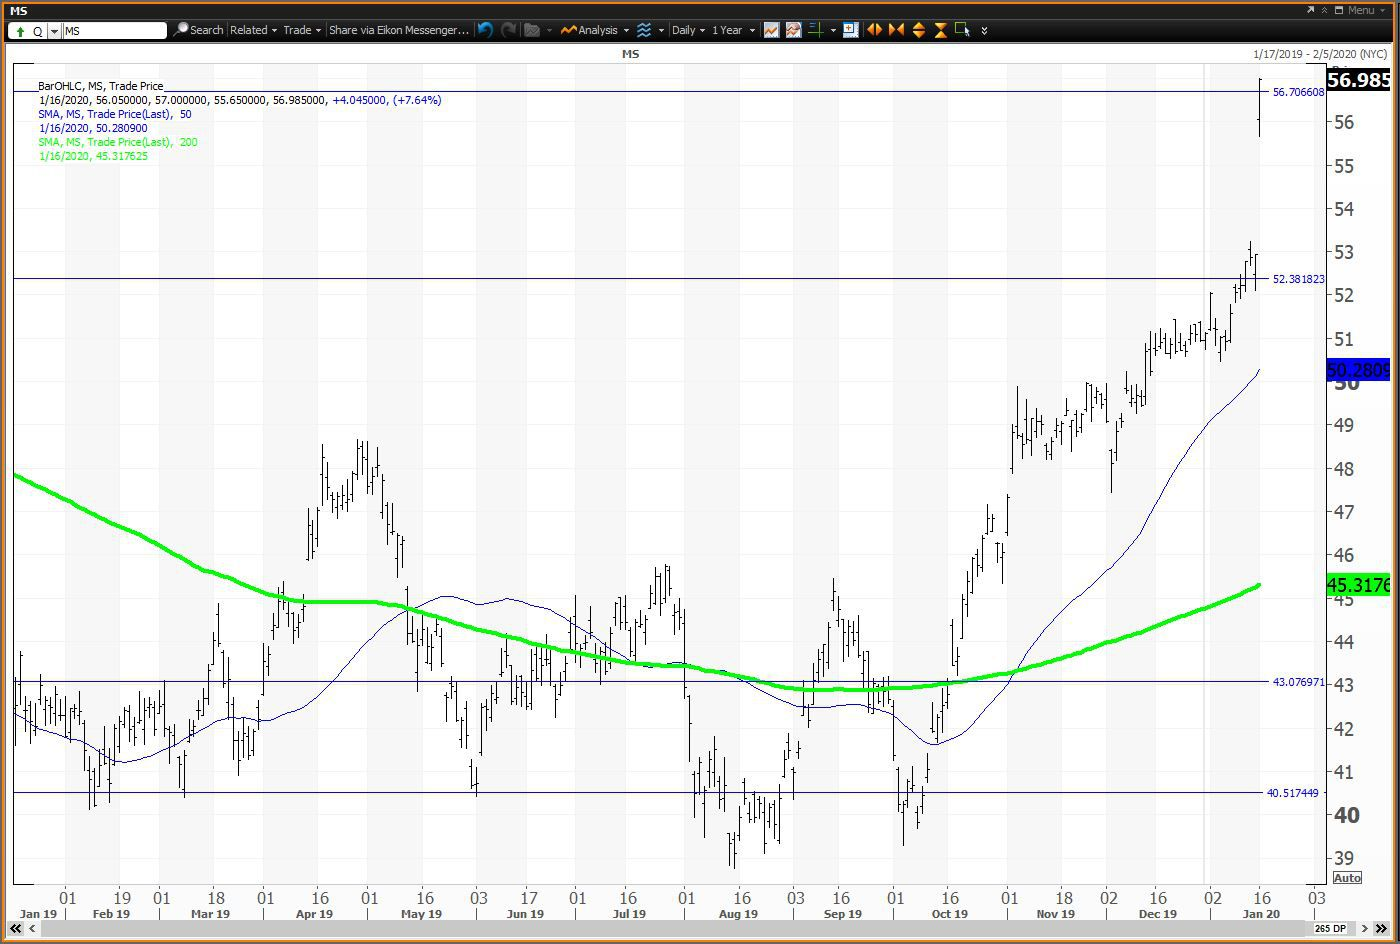 Morgan Stanley Stock Gaps Higher on Earnings